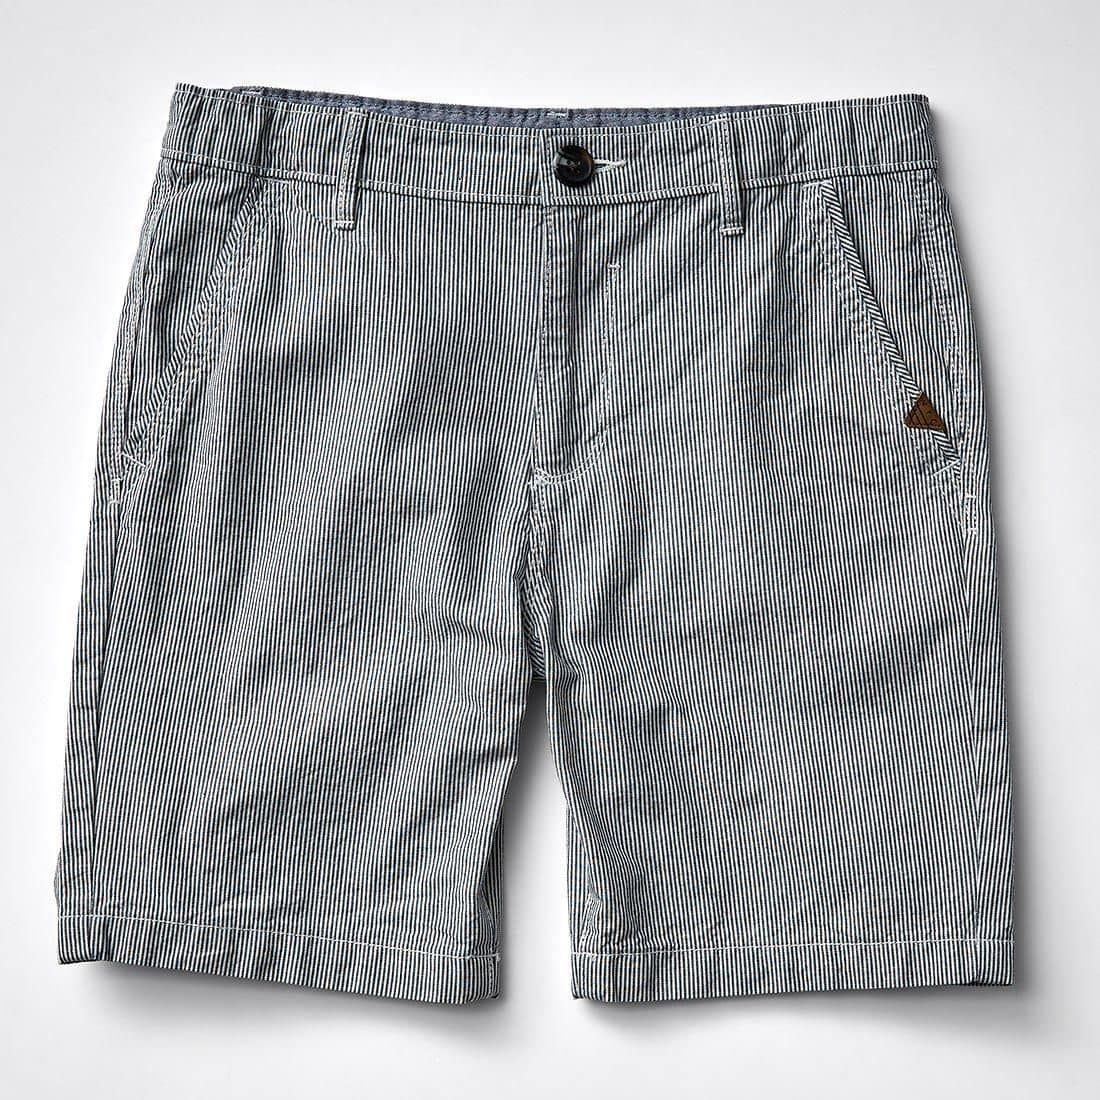 00657f8cfa3b4 DENIM Look Terry Shorts in 2019   Шорты   Denim, Shorts, Patterned jeans